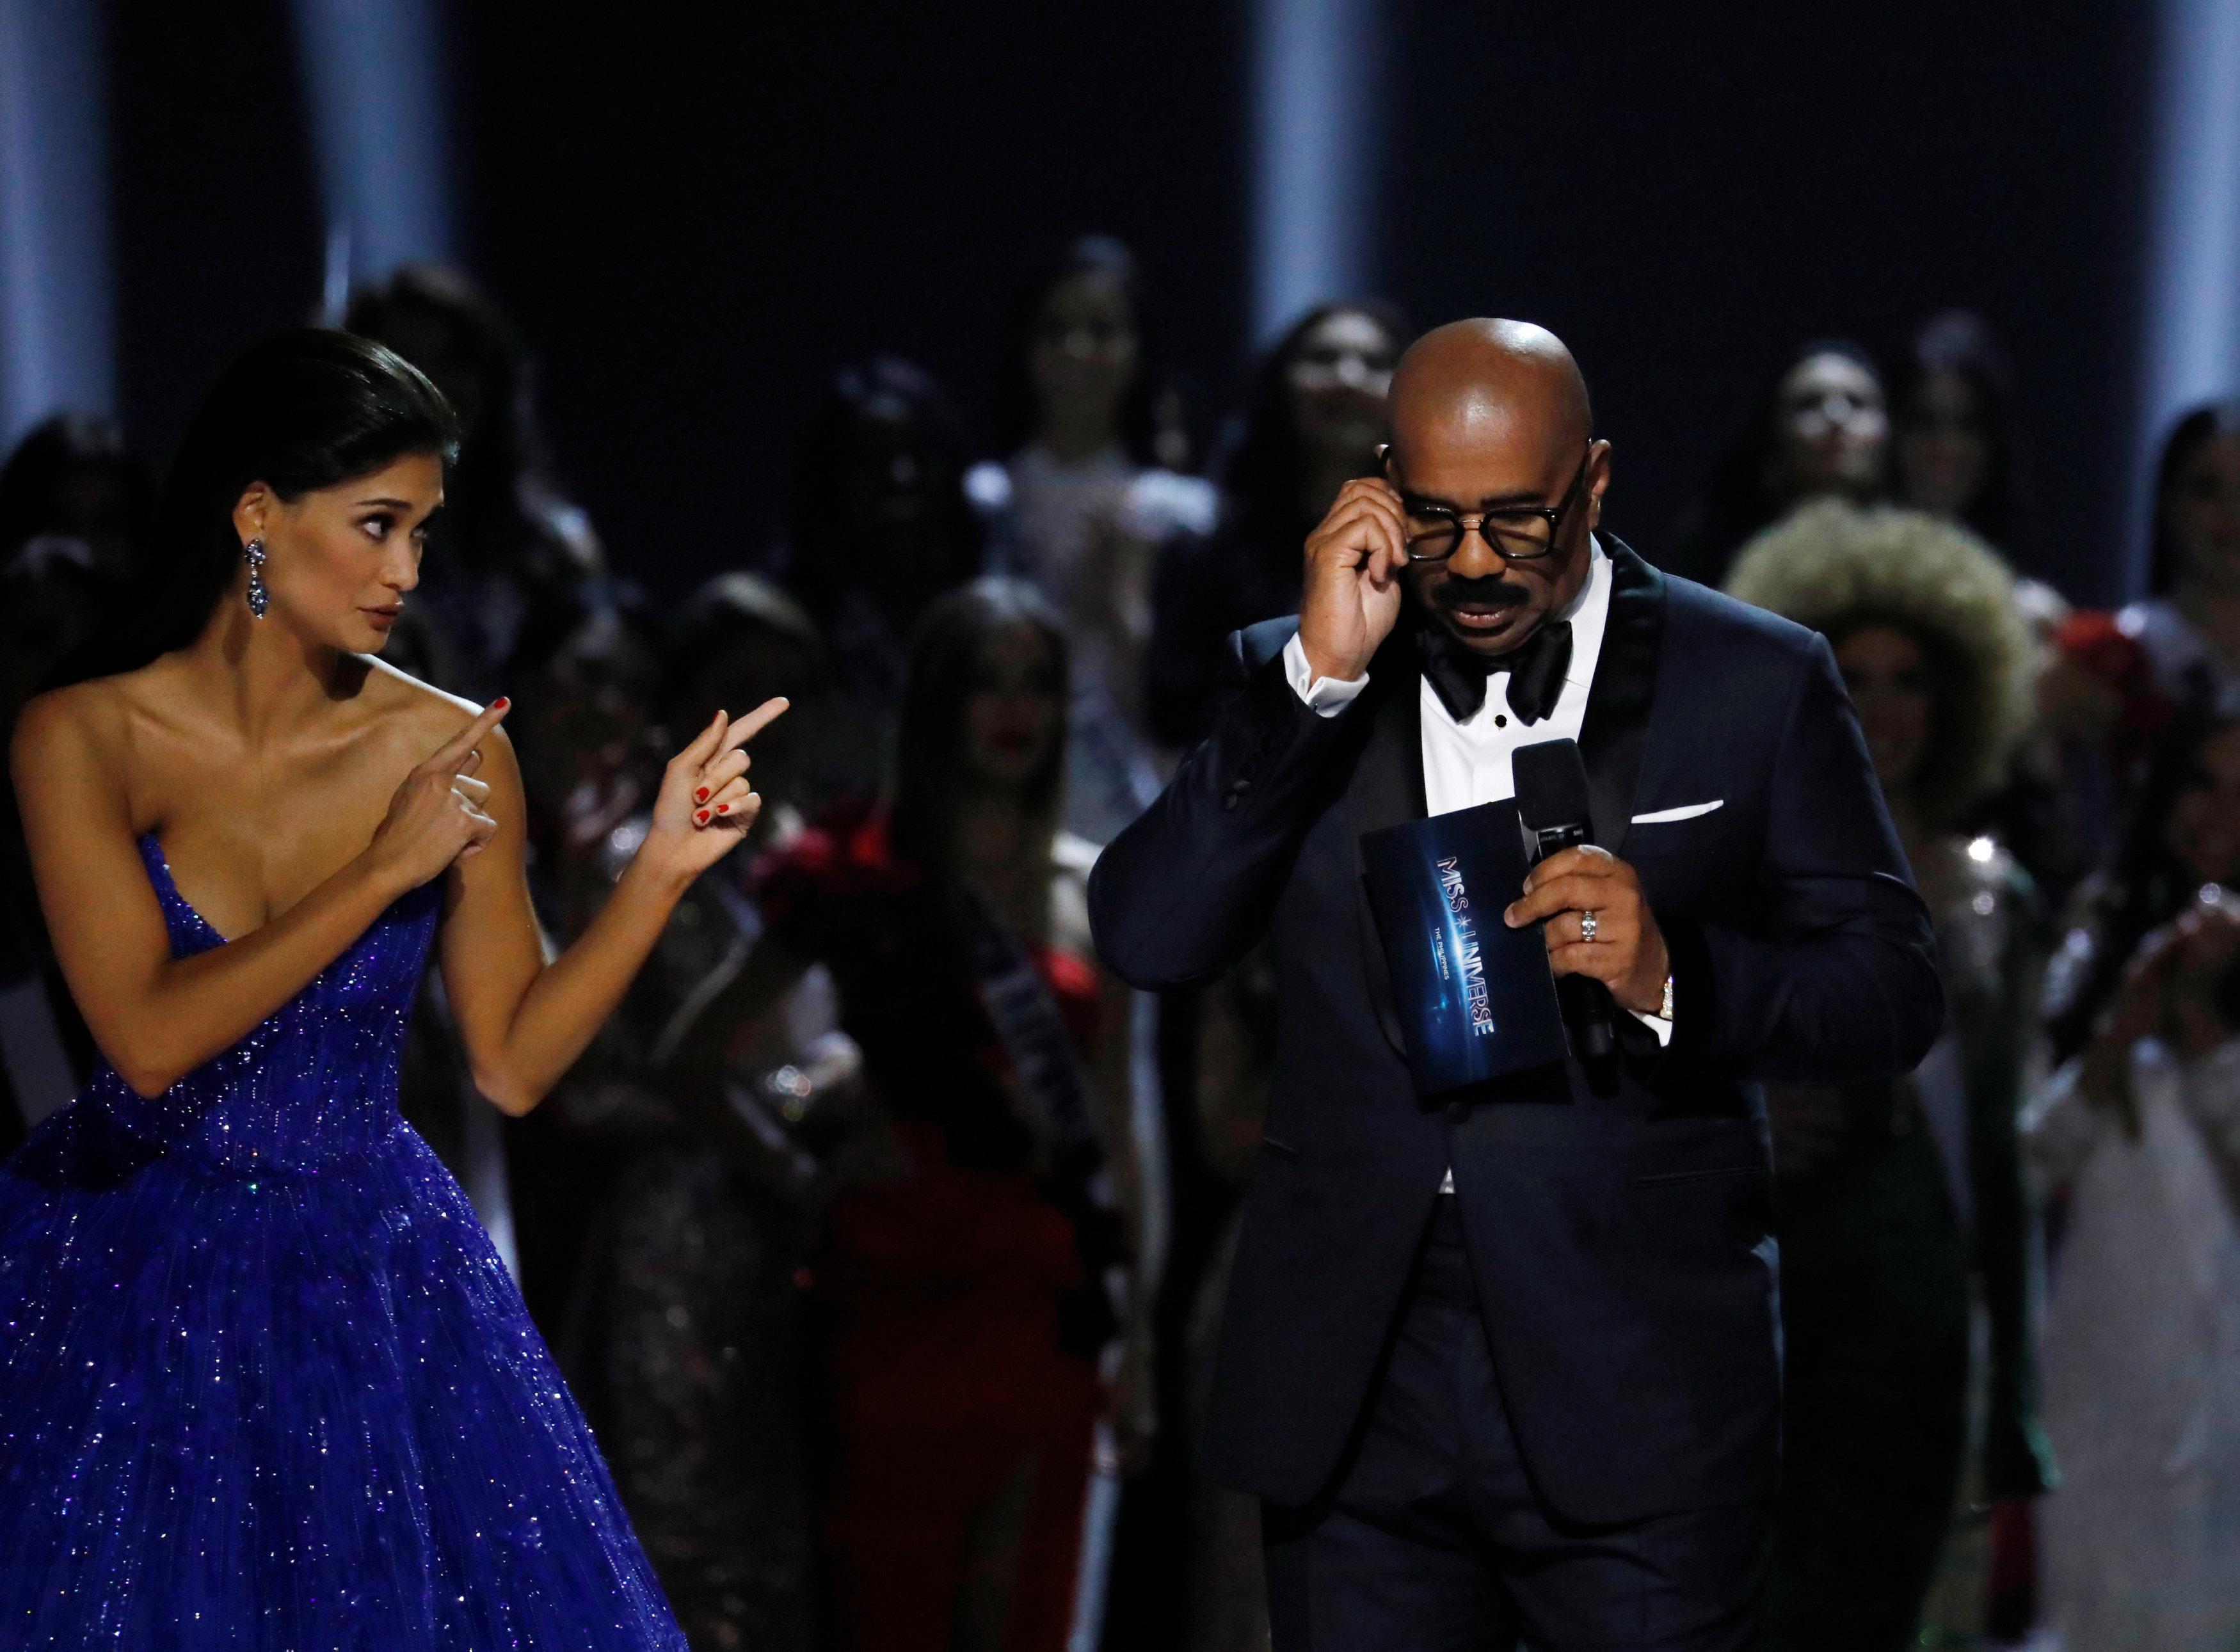 Pia Wurtzbach's final shining moments as Miss Universe